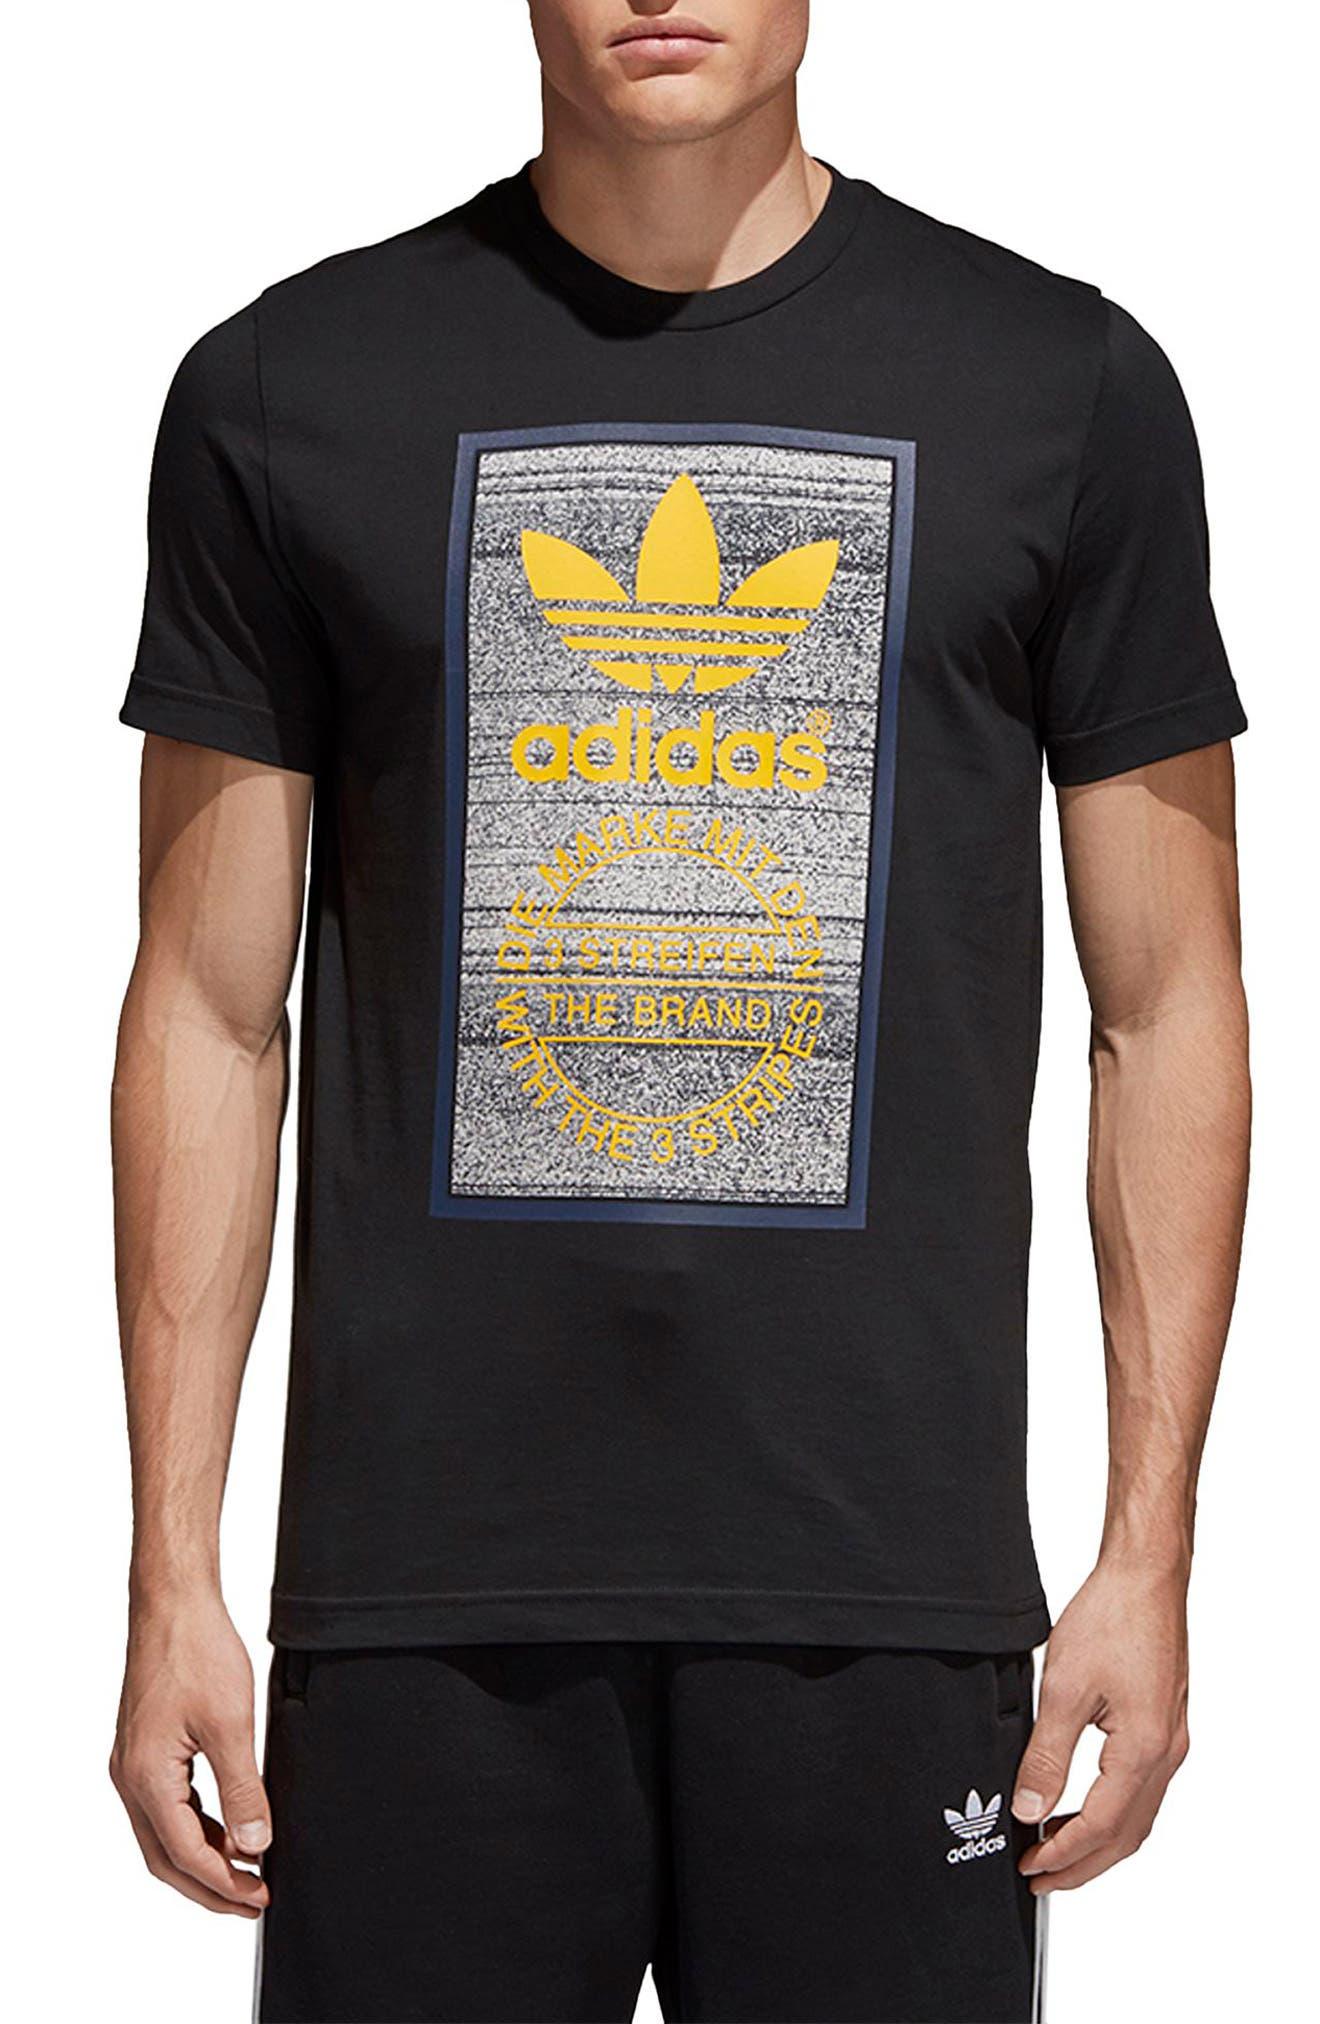 Main Image - adidas Originals Traction in Action T-Shirt